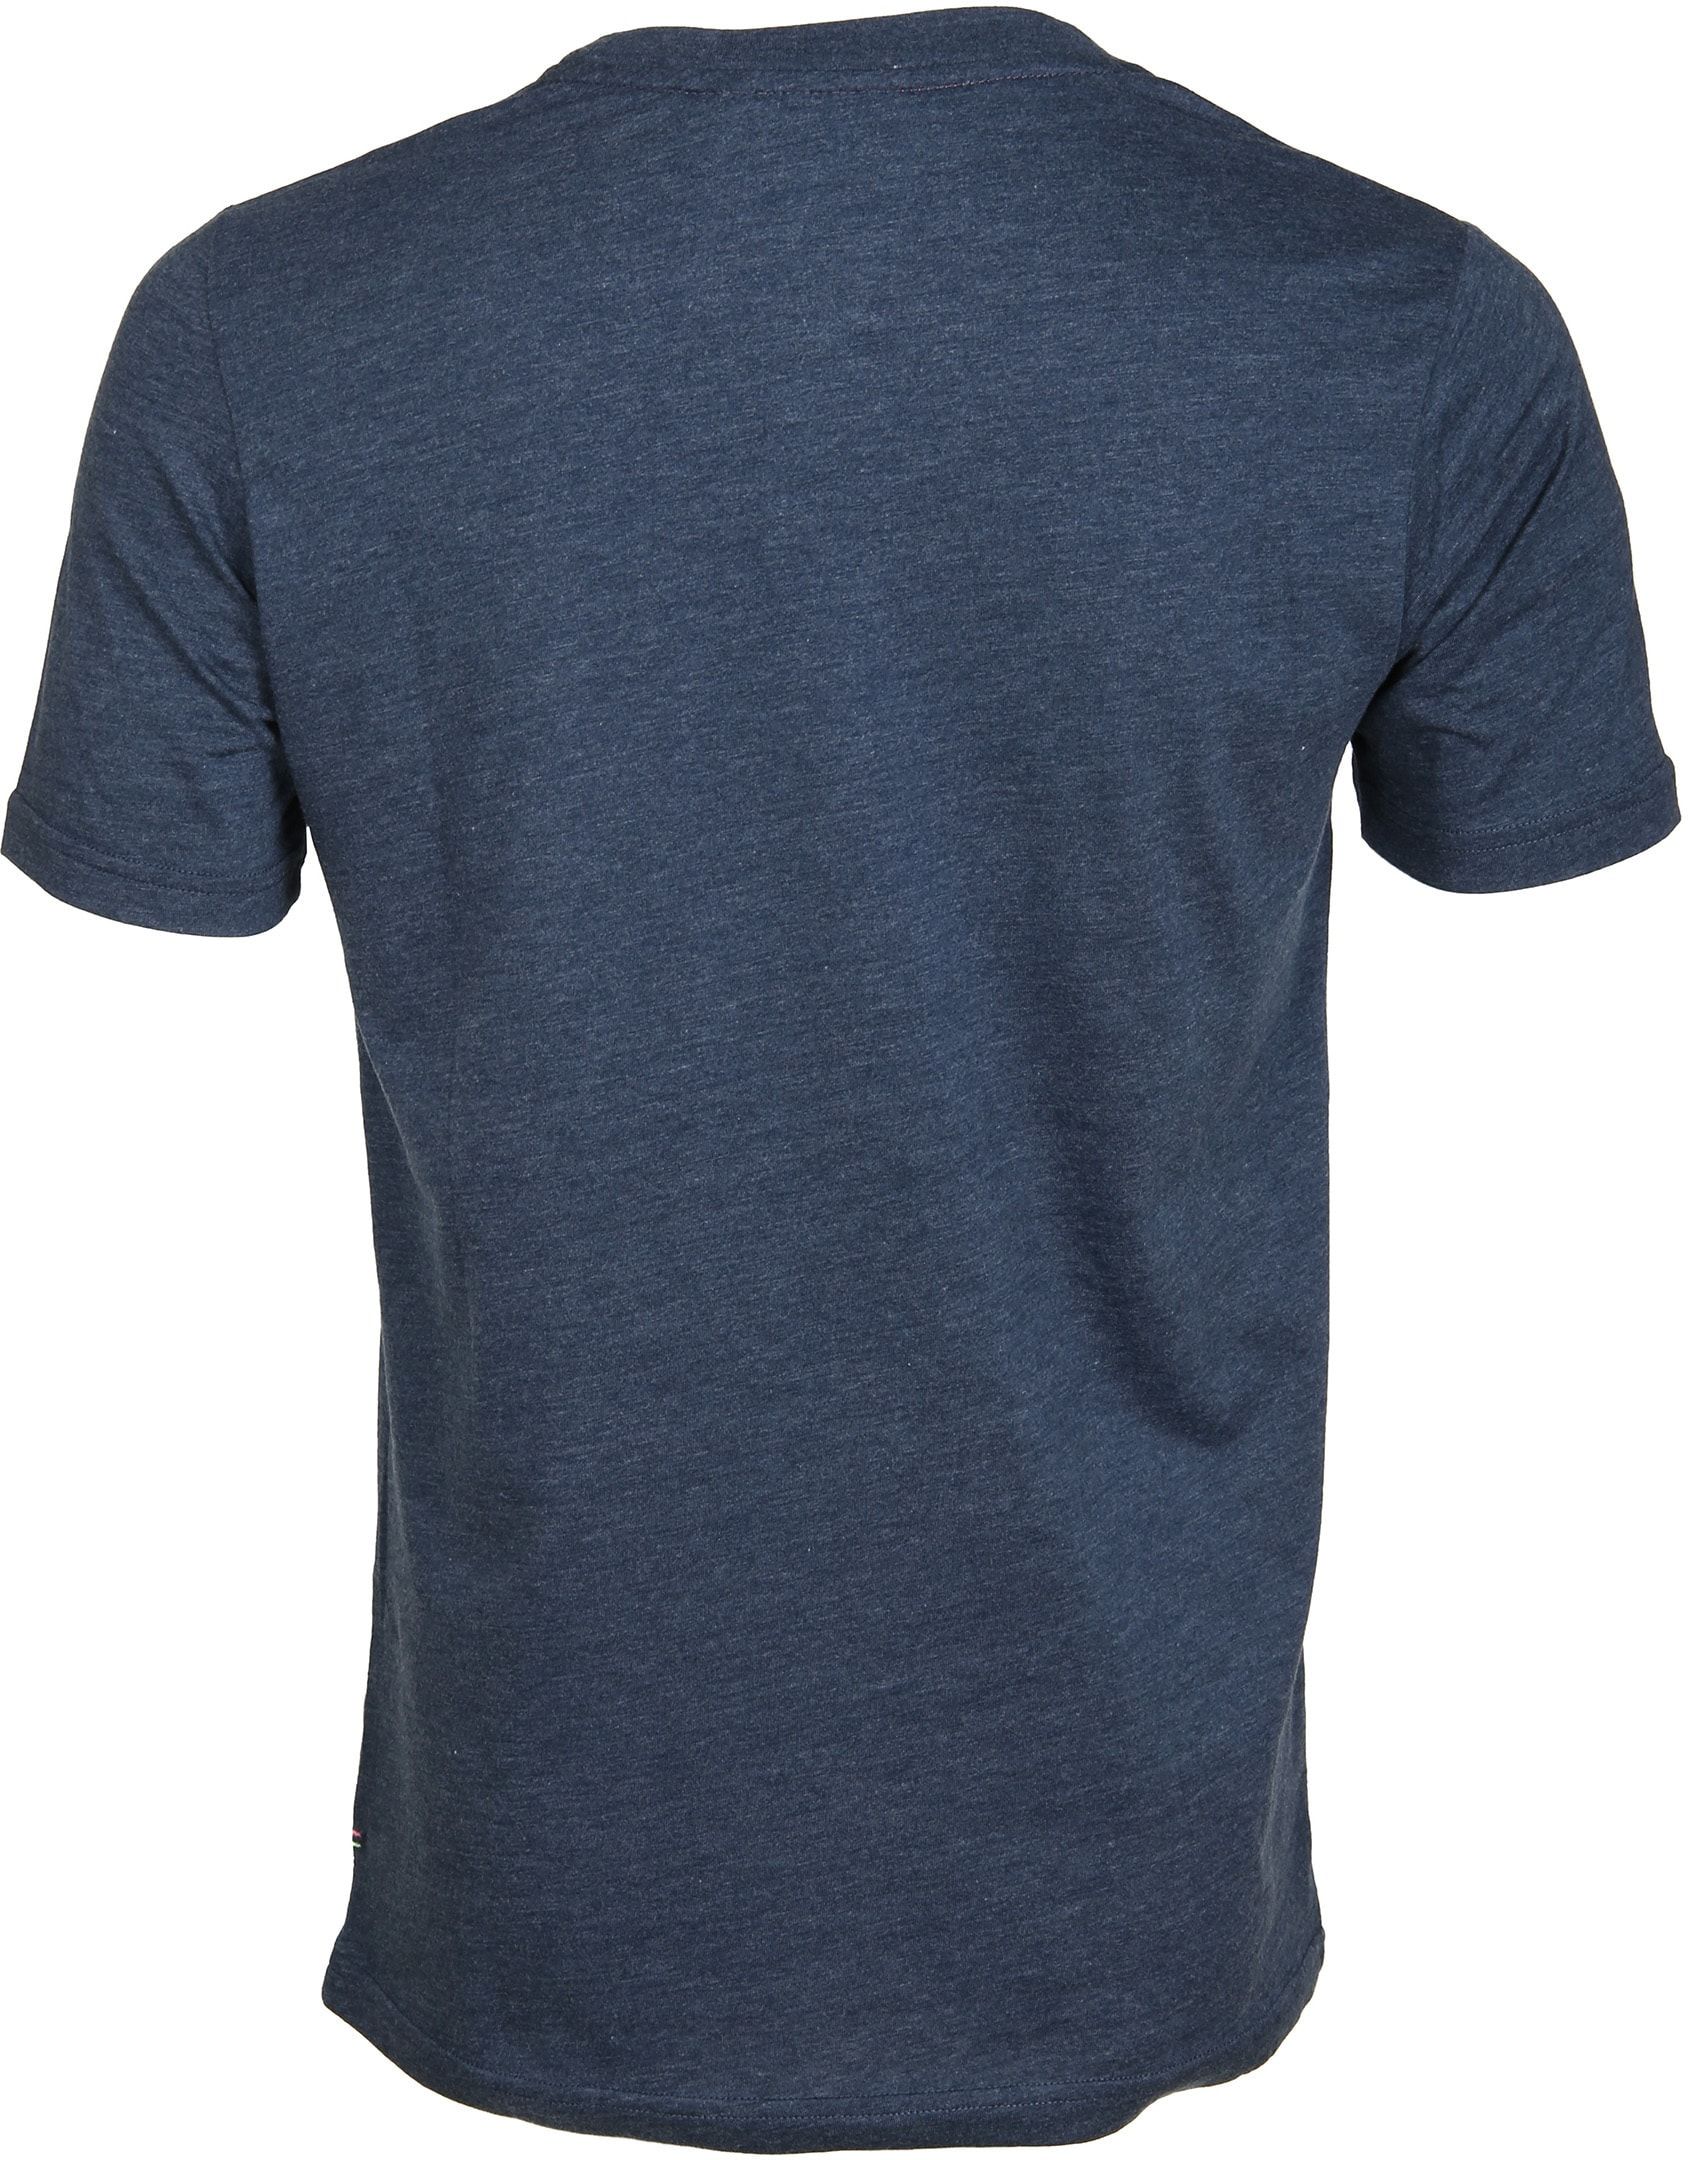 NZA Dampier T-shirt Dunkelblau foto 2